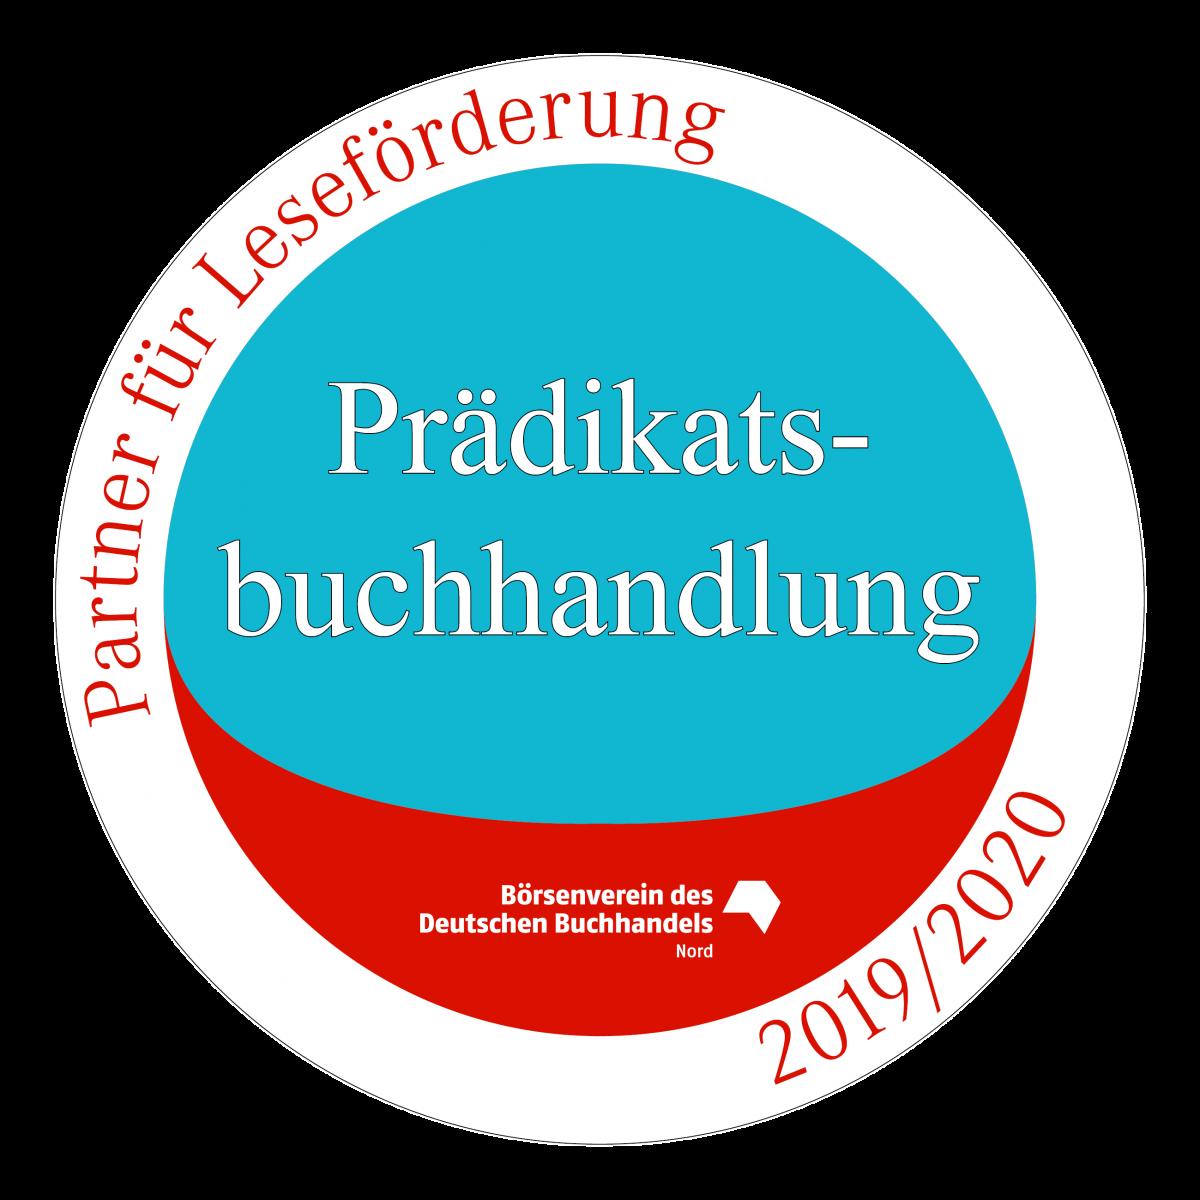 logo_praedikatsbuchhandlungrand.png